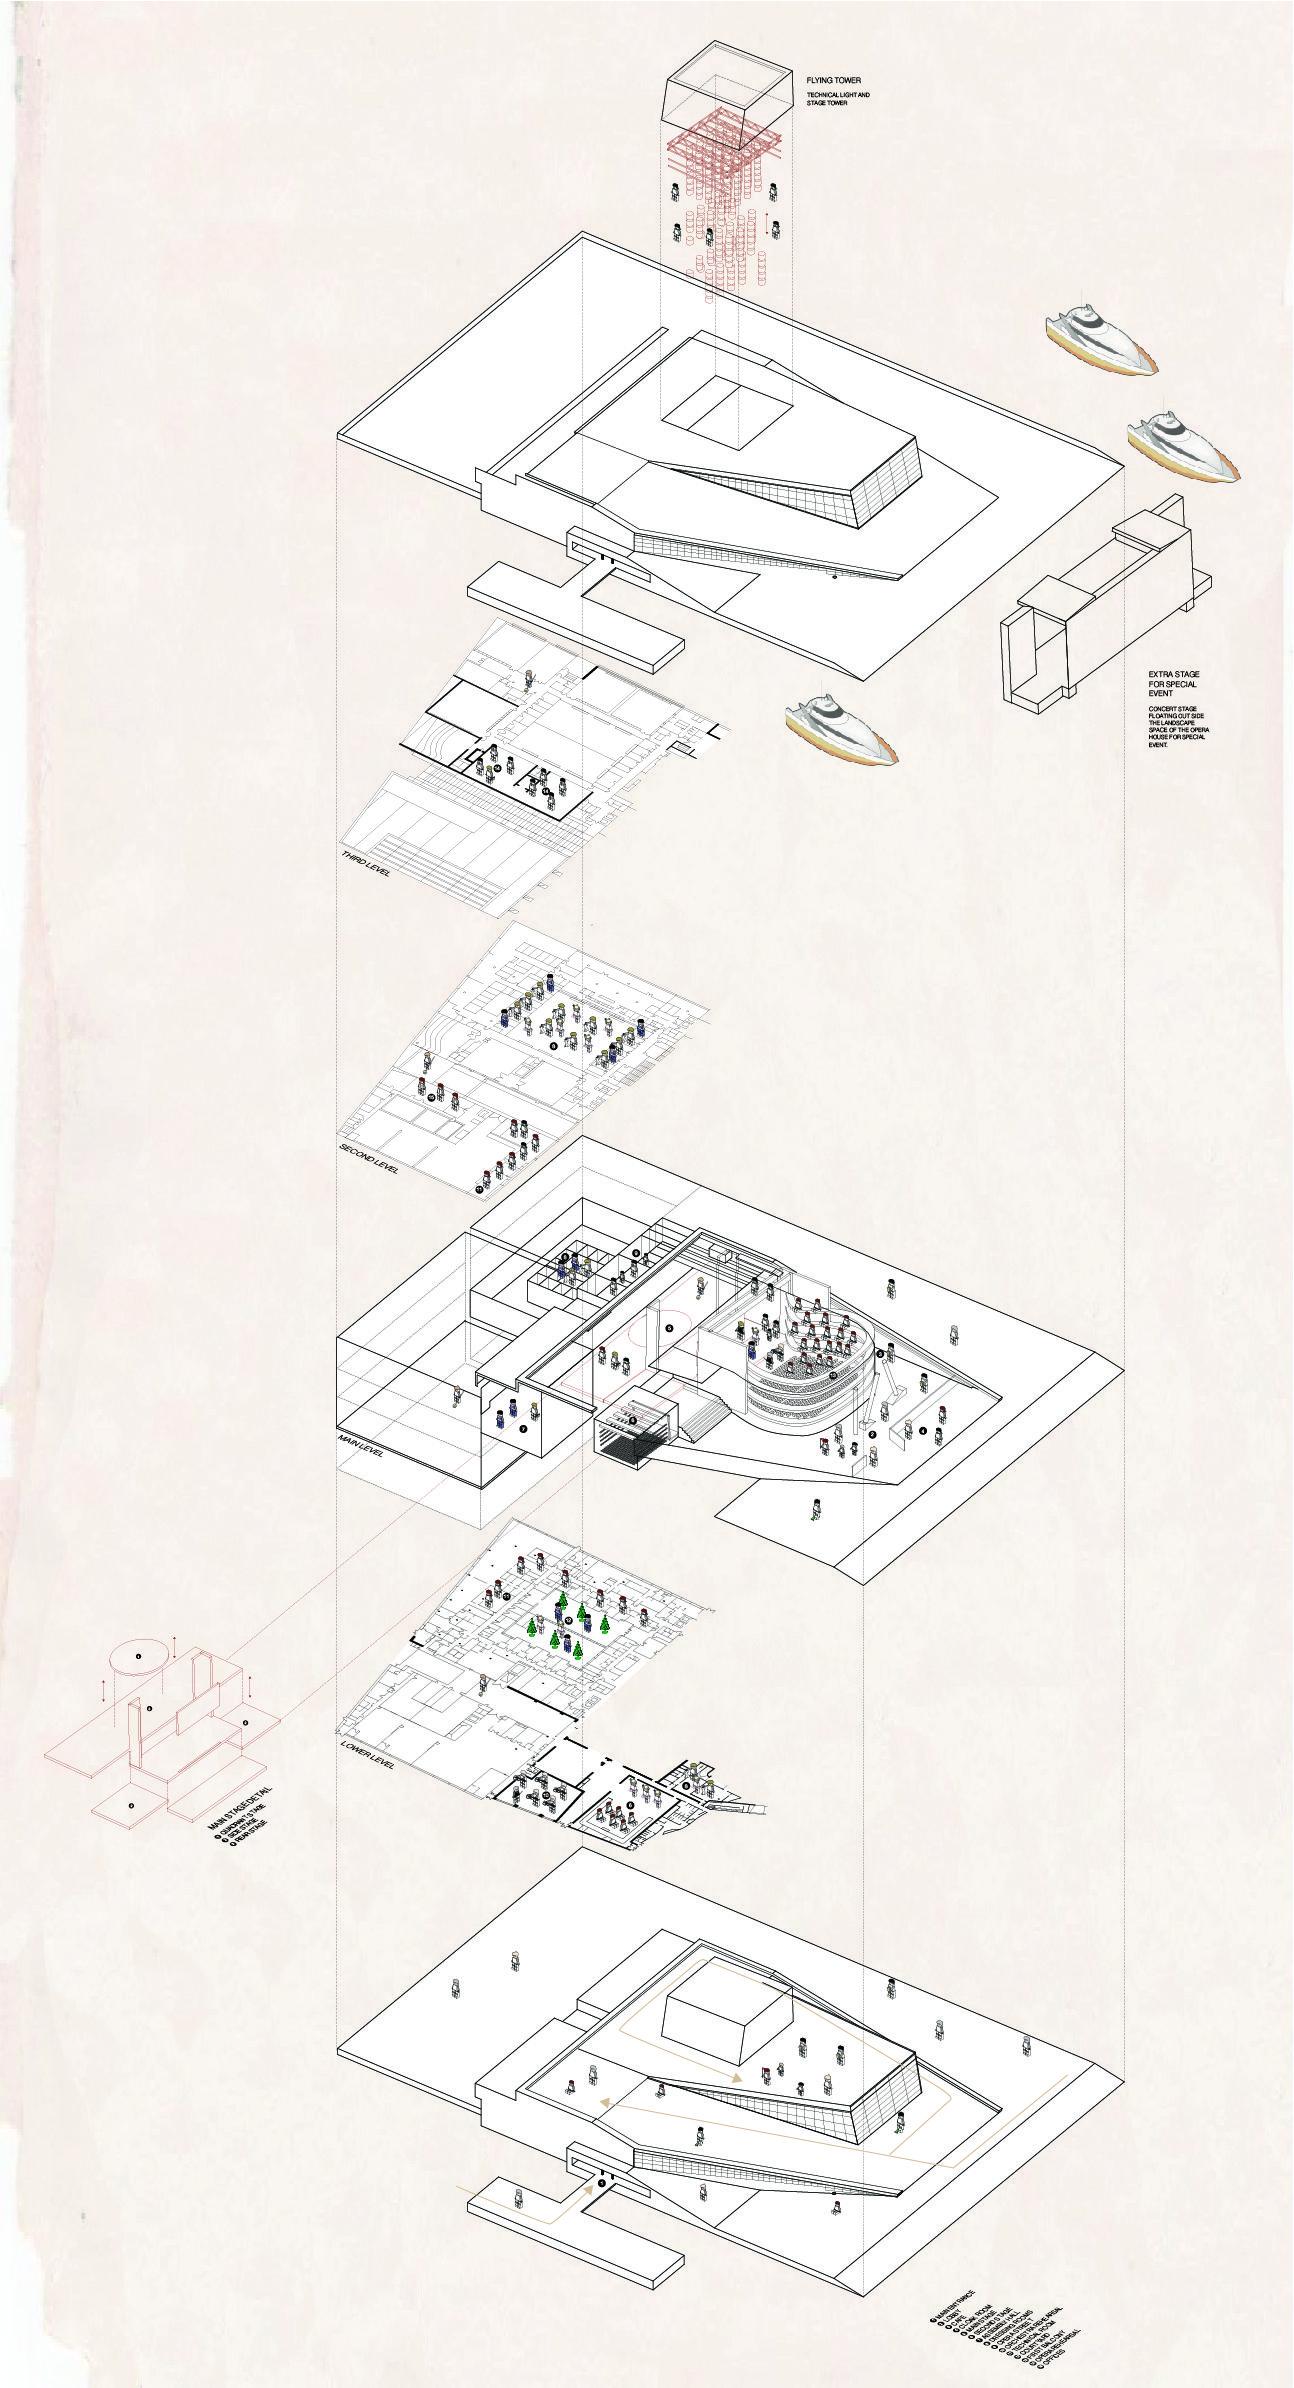 Mew Praewa Samachai Isometric detail of oslo opera house